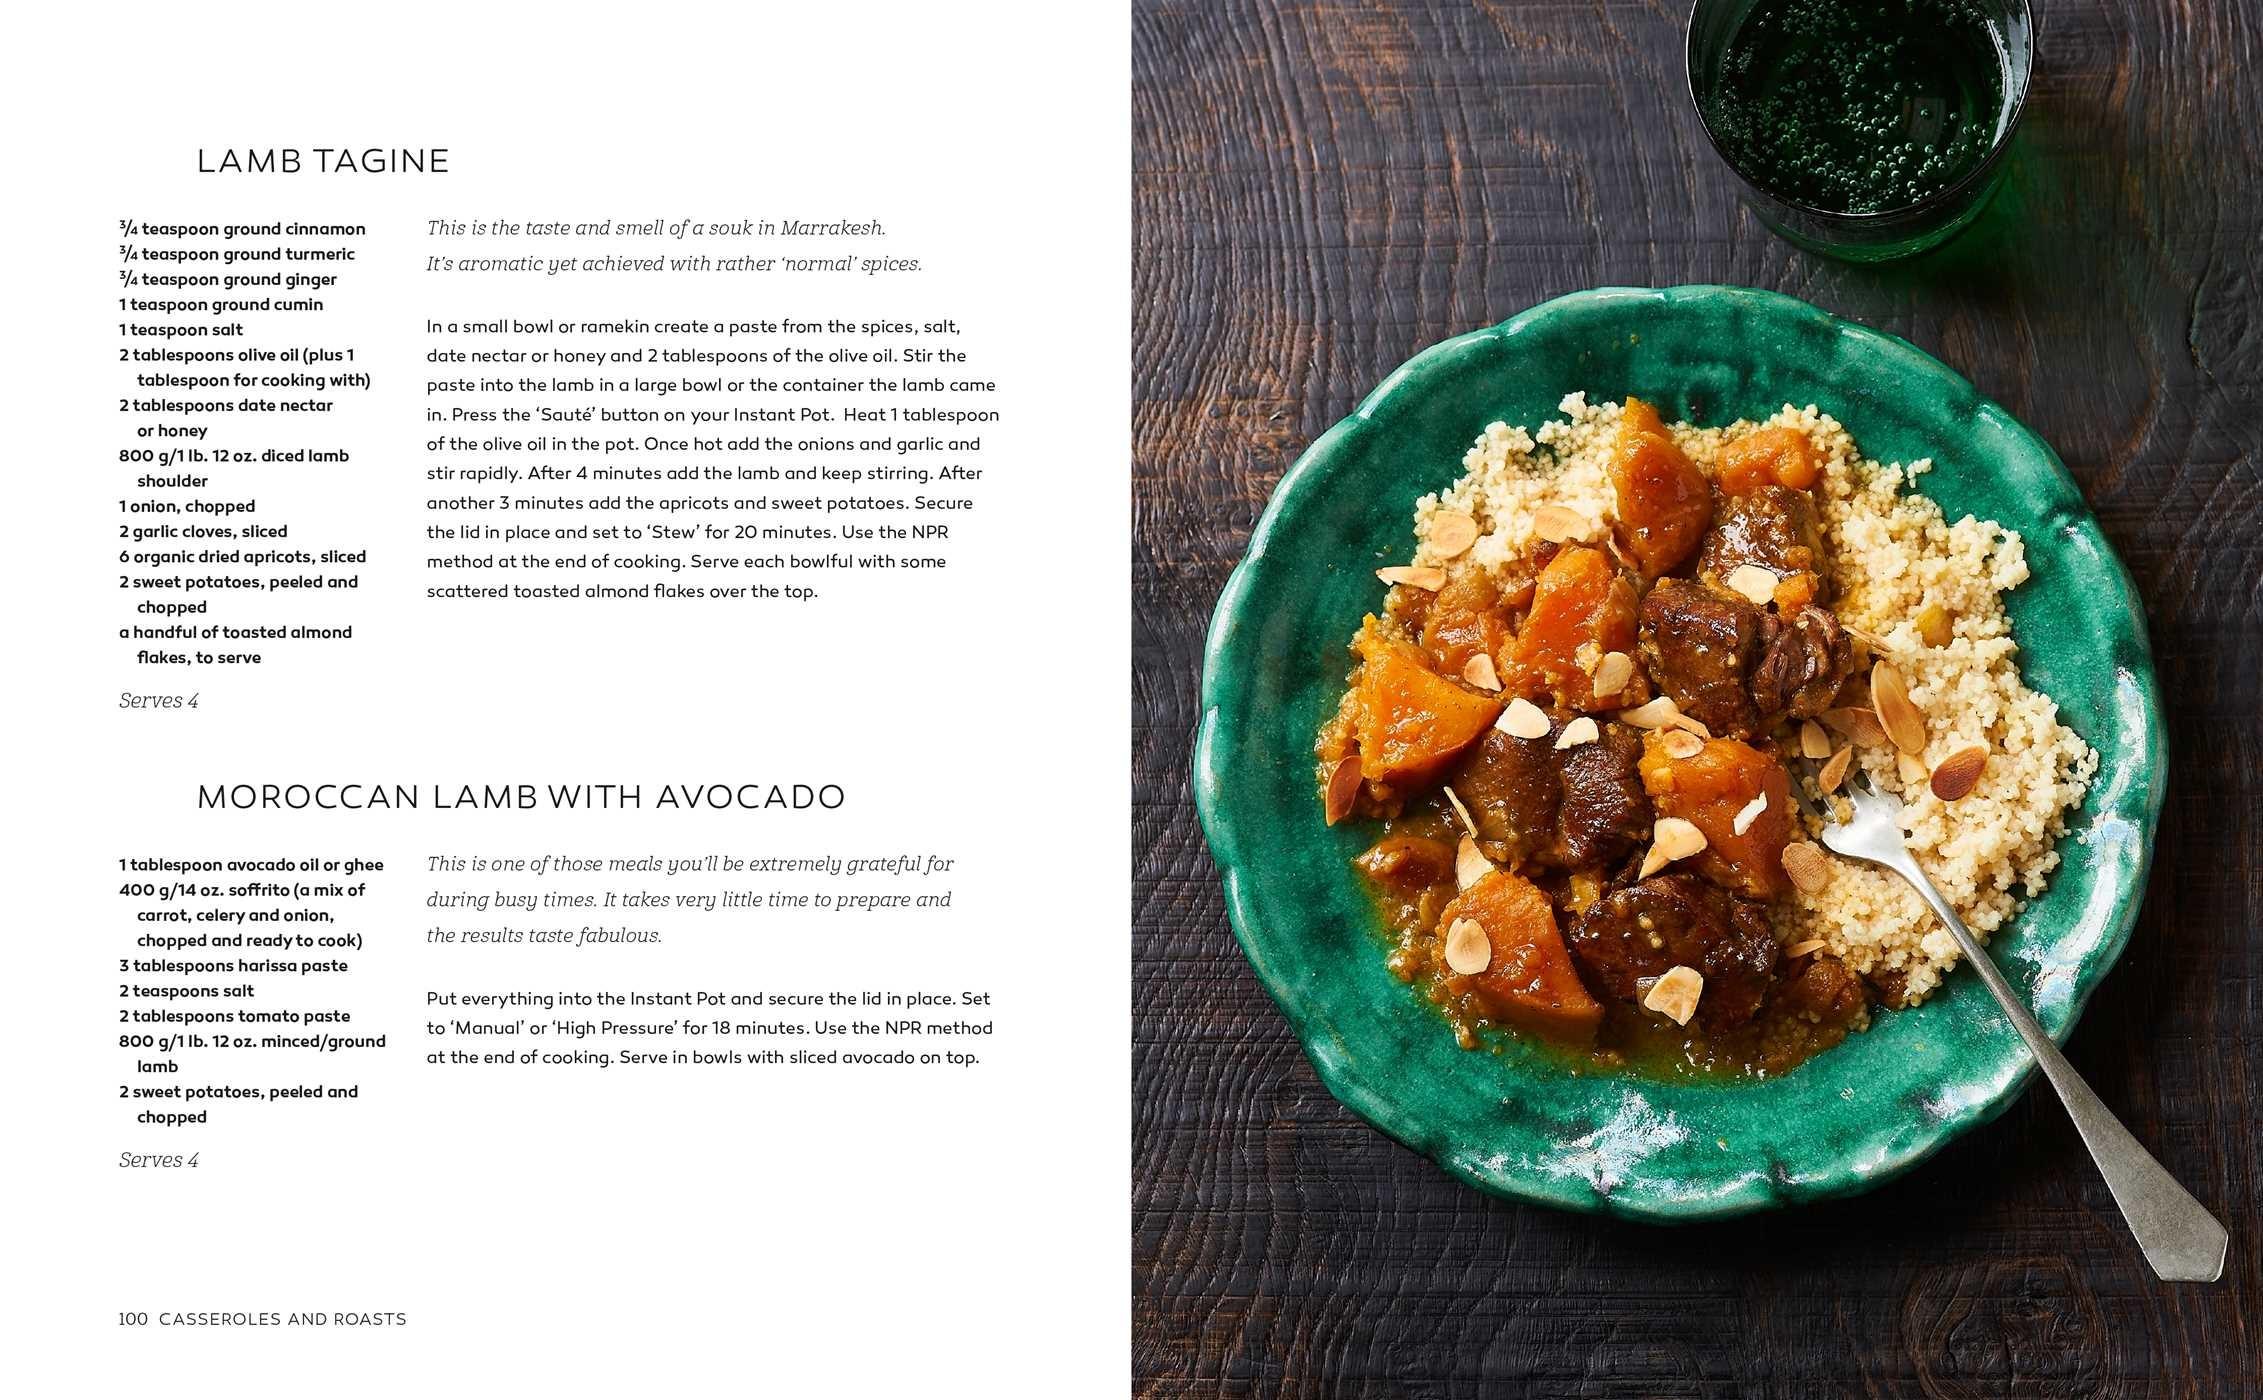 The modern multi cooker cookbook 9781849759731.in01